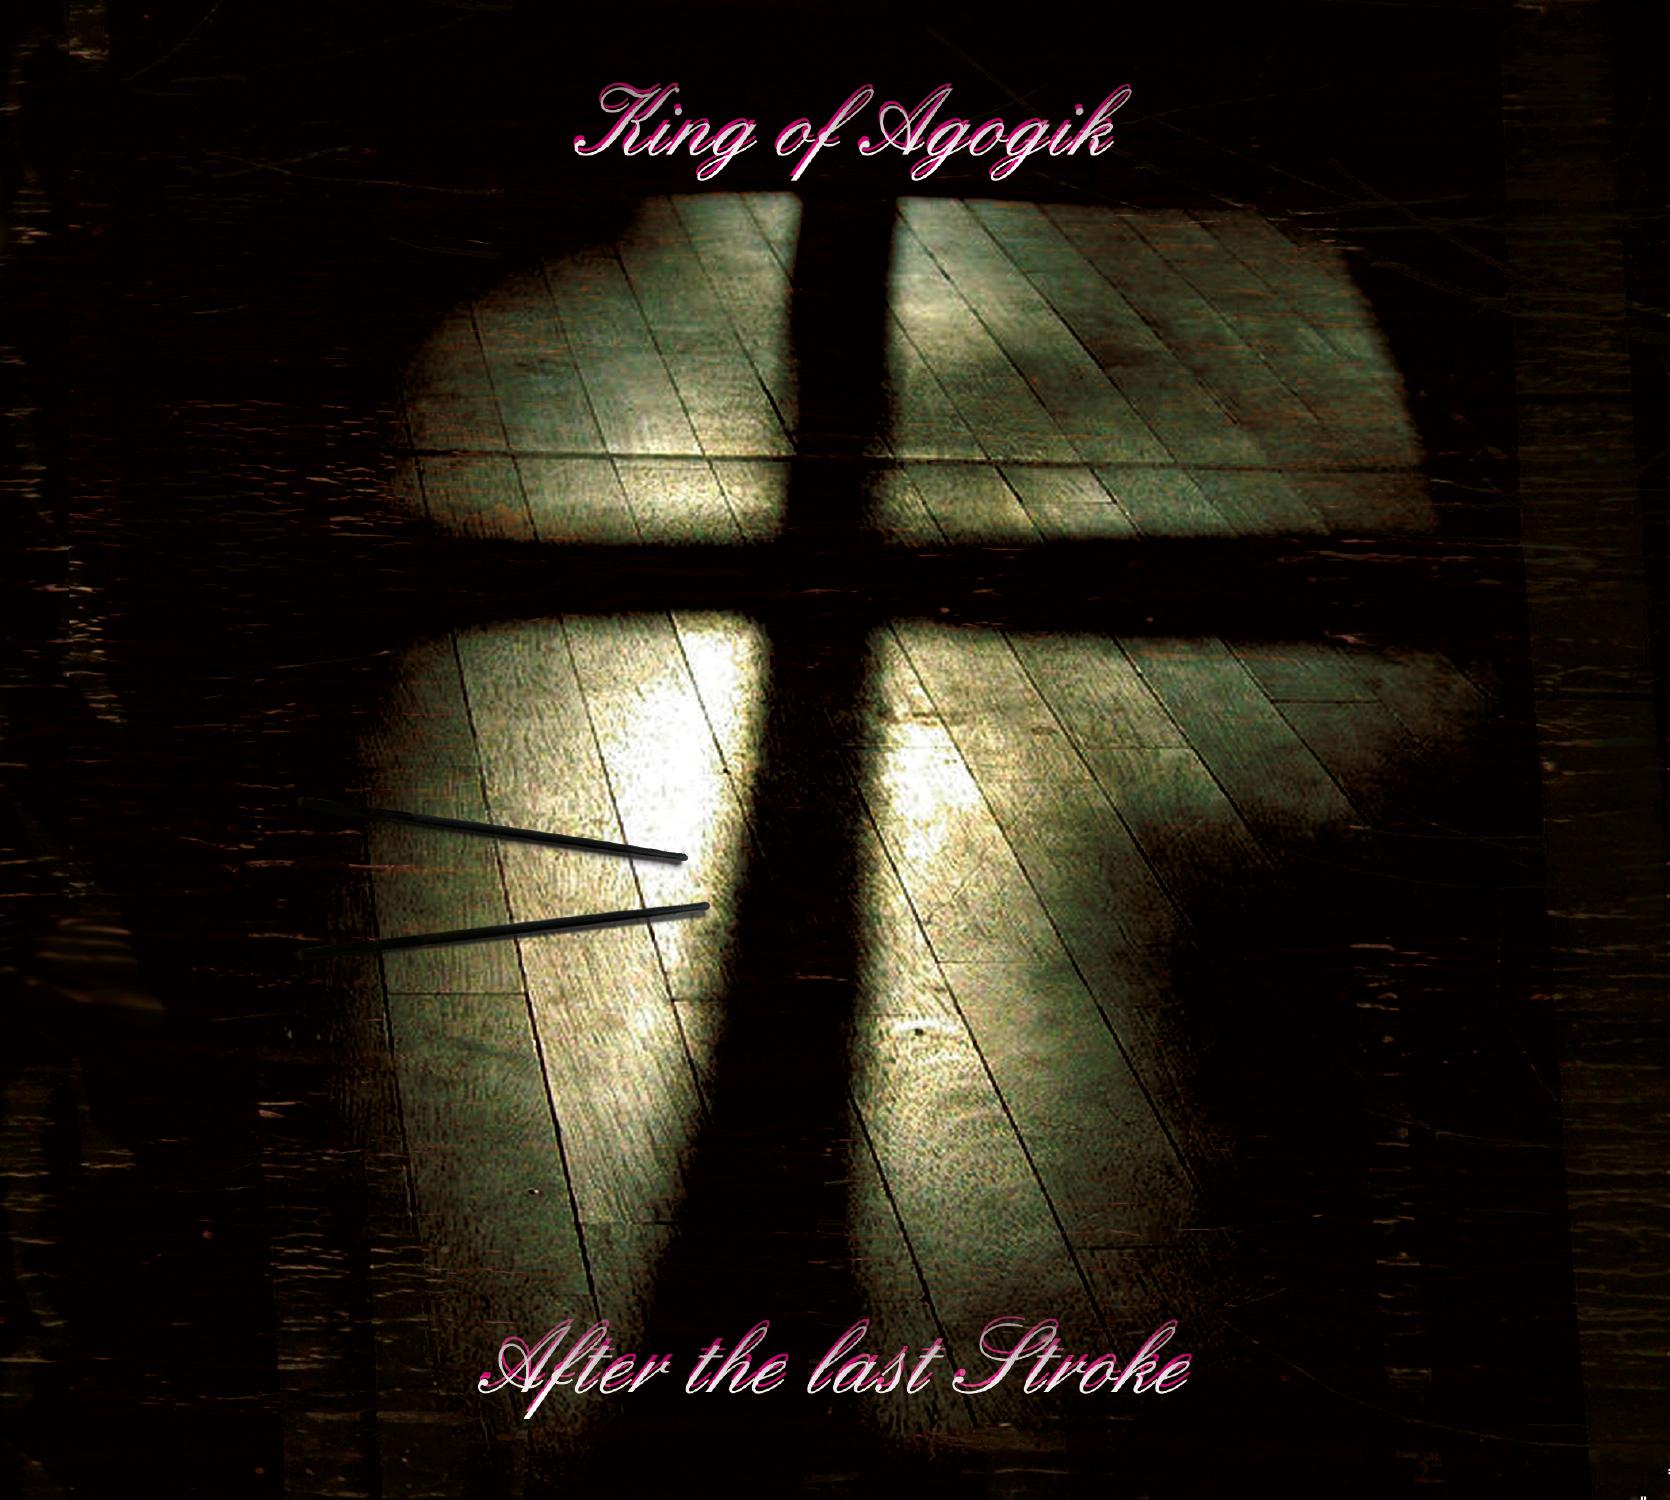 King of Agogik – After the last Stroke